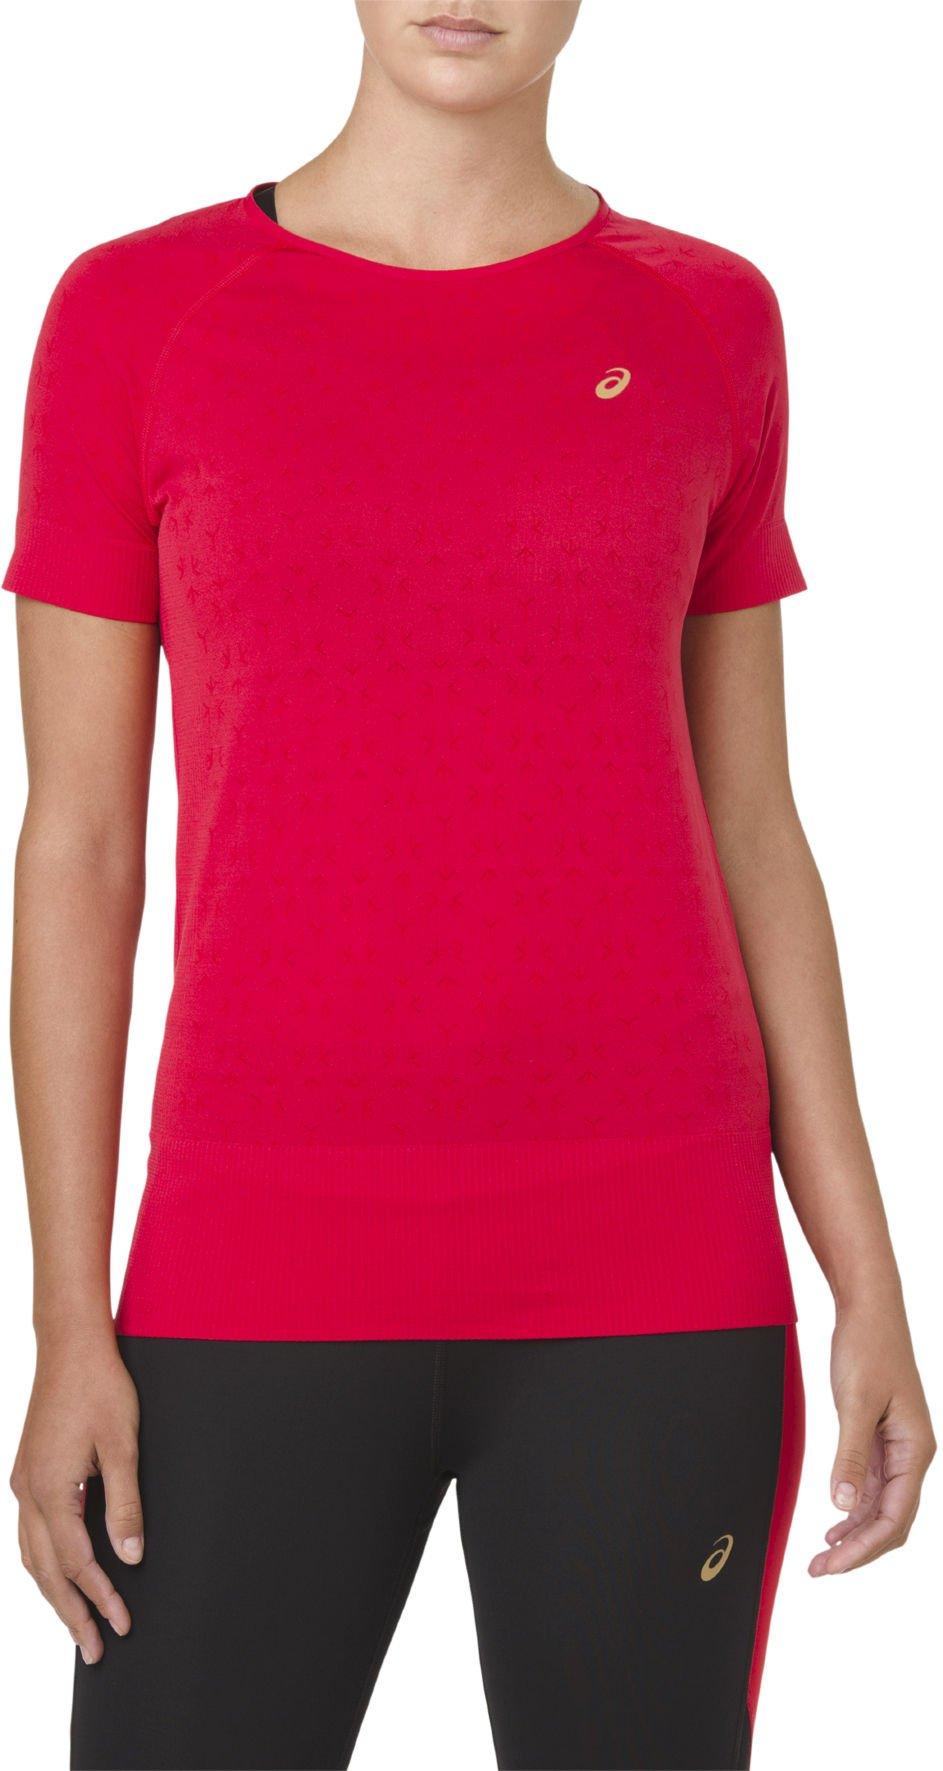 Dámské běžecké tričko Seamless Texture